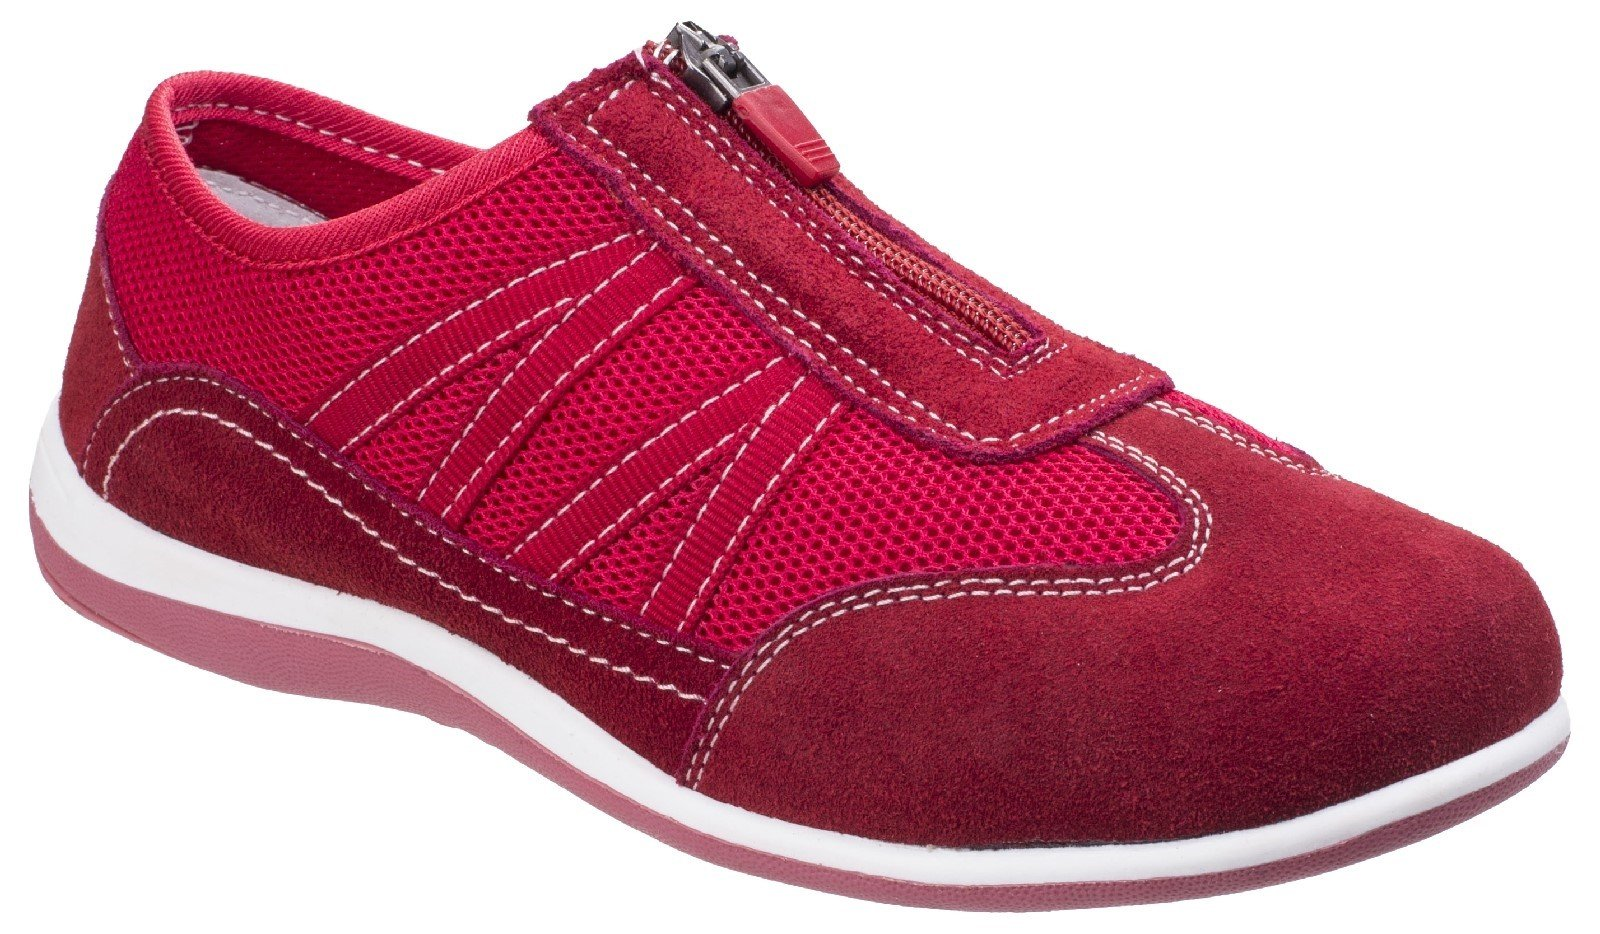 Fleet & Foster Women's Mombassa Comfort Trainer Various Colours 26306-43902 - Red 3